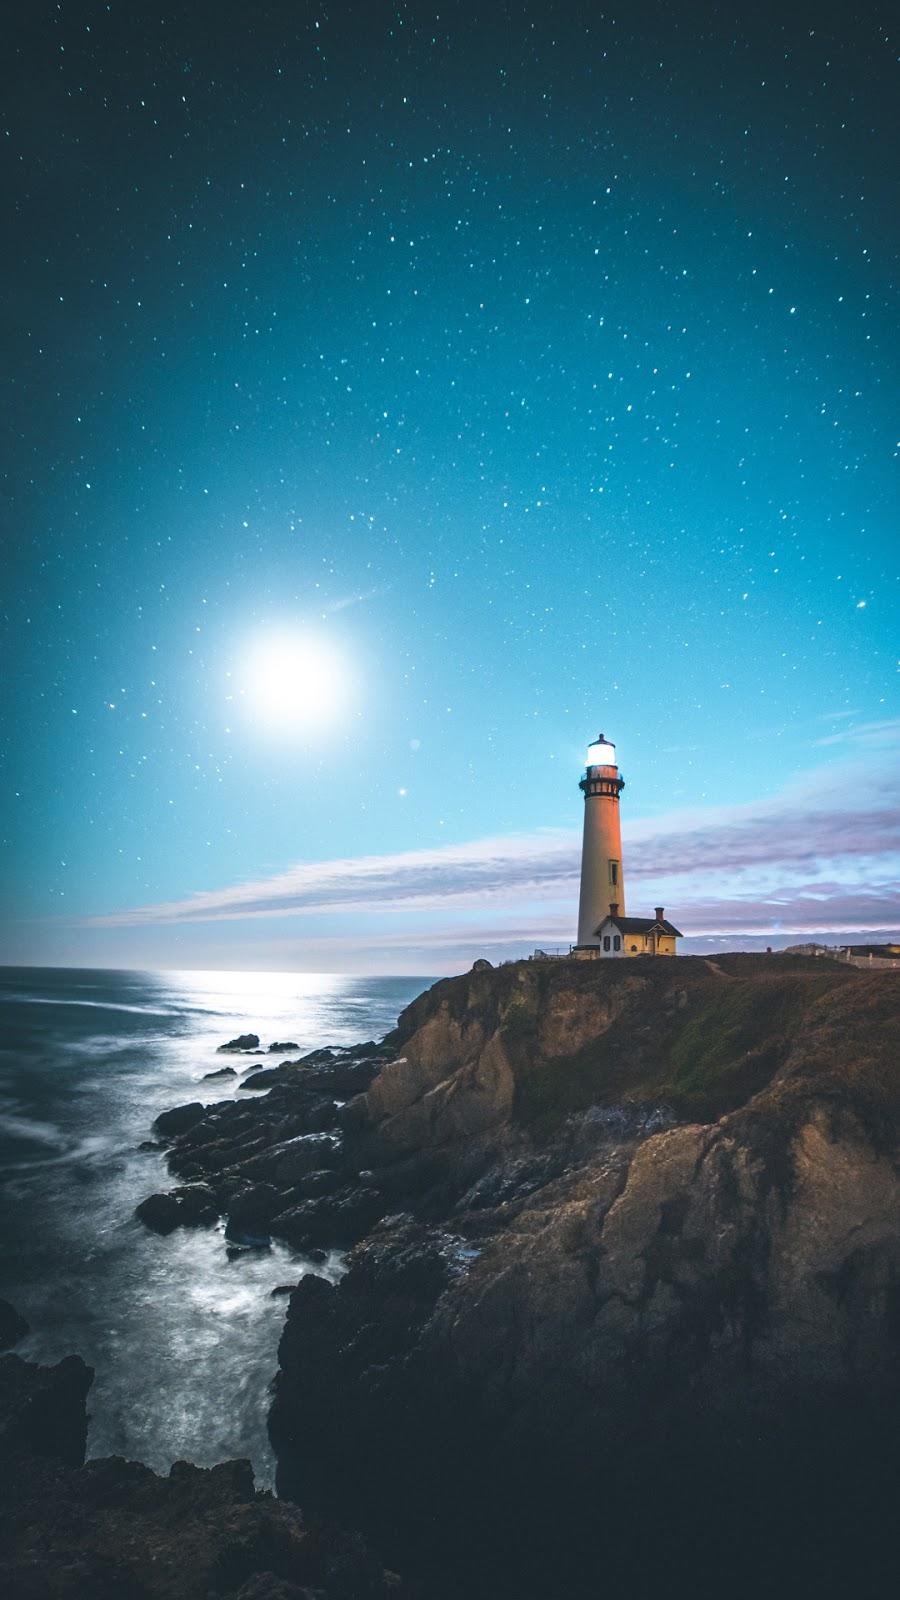 Amazing starry night